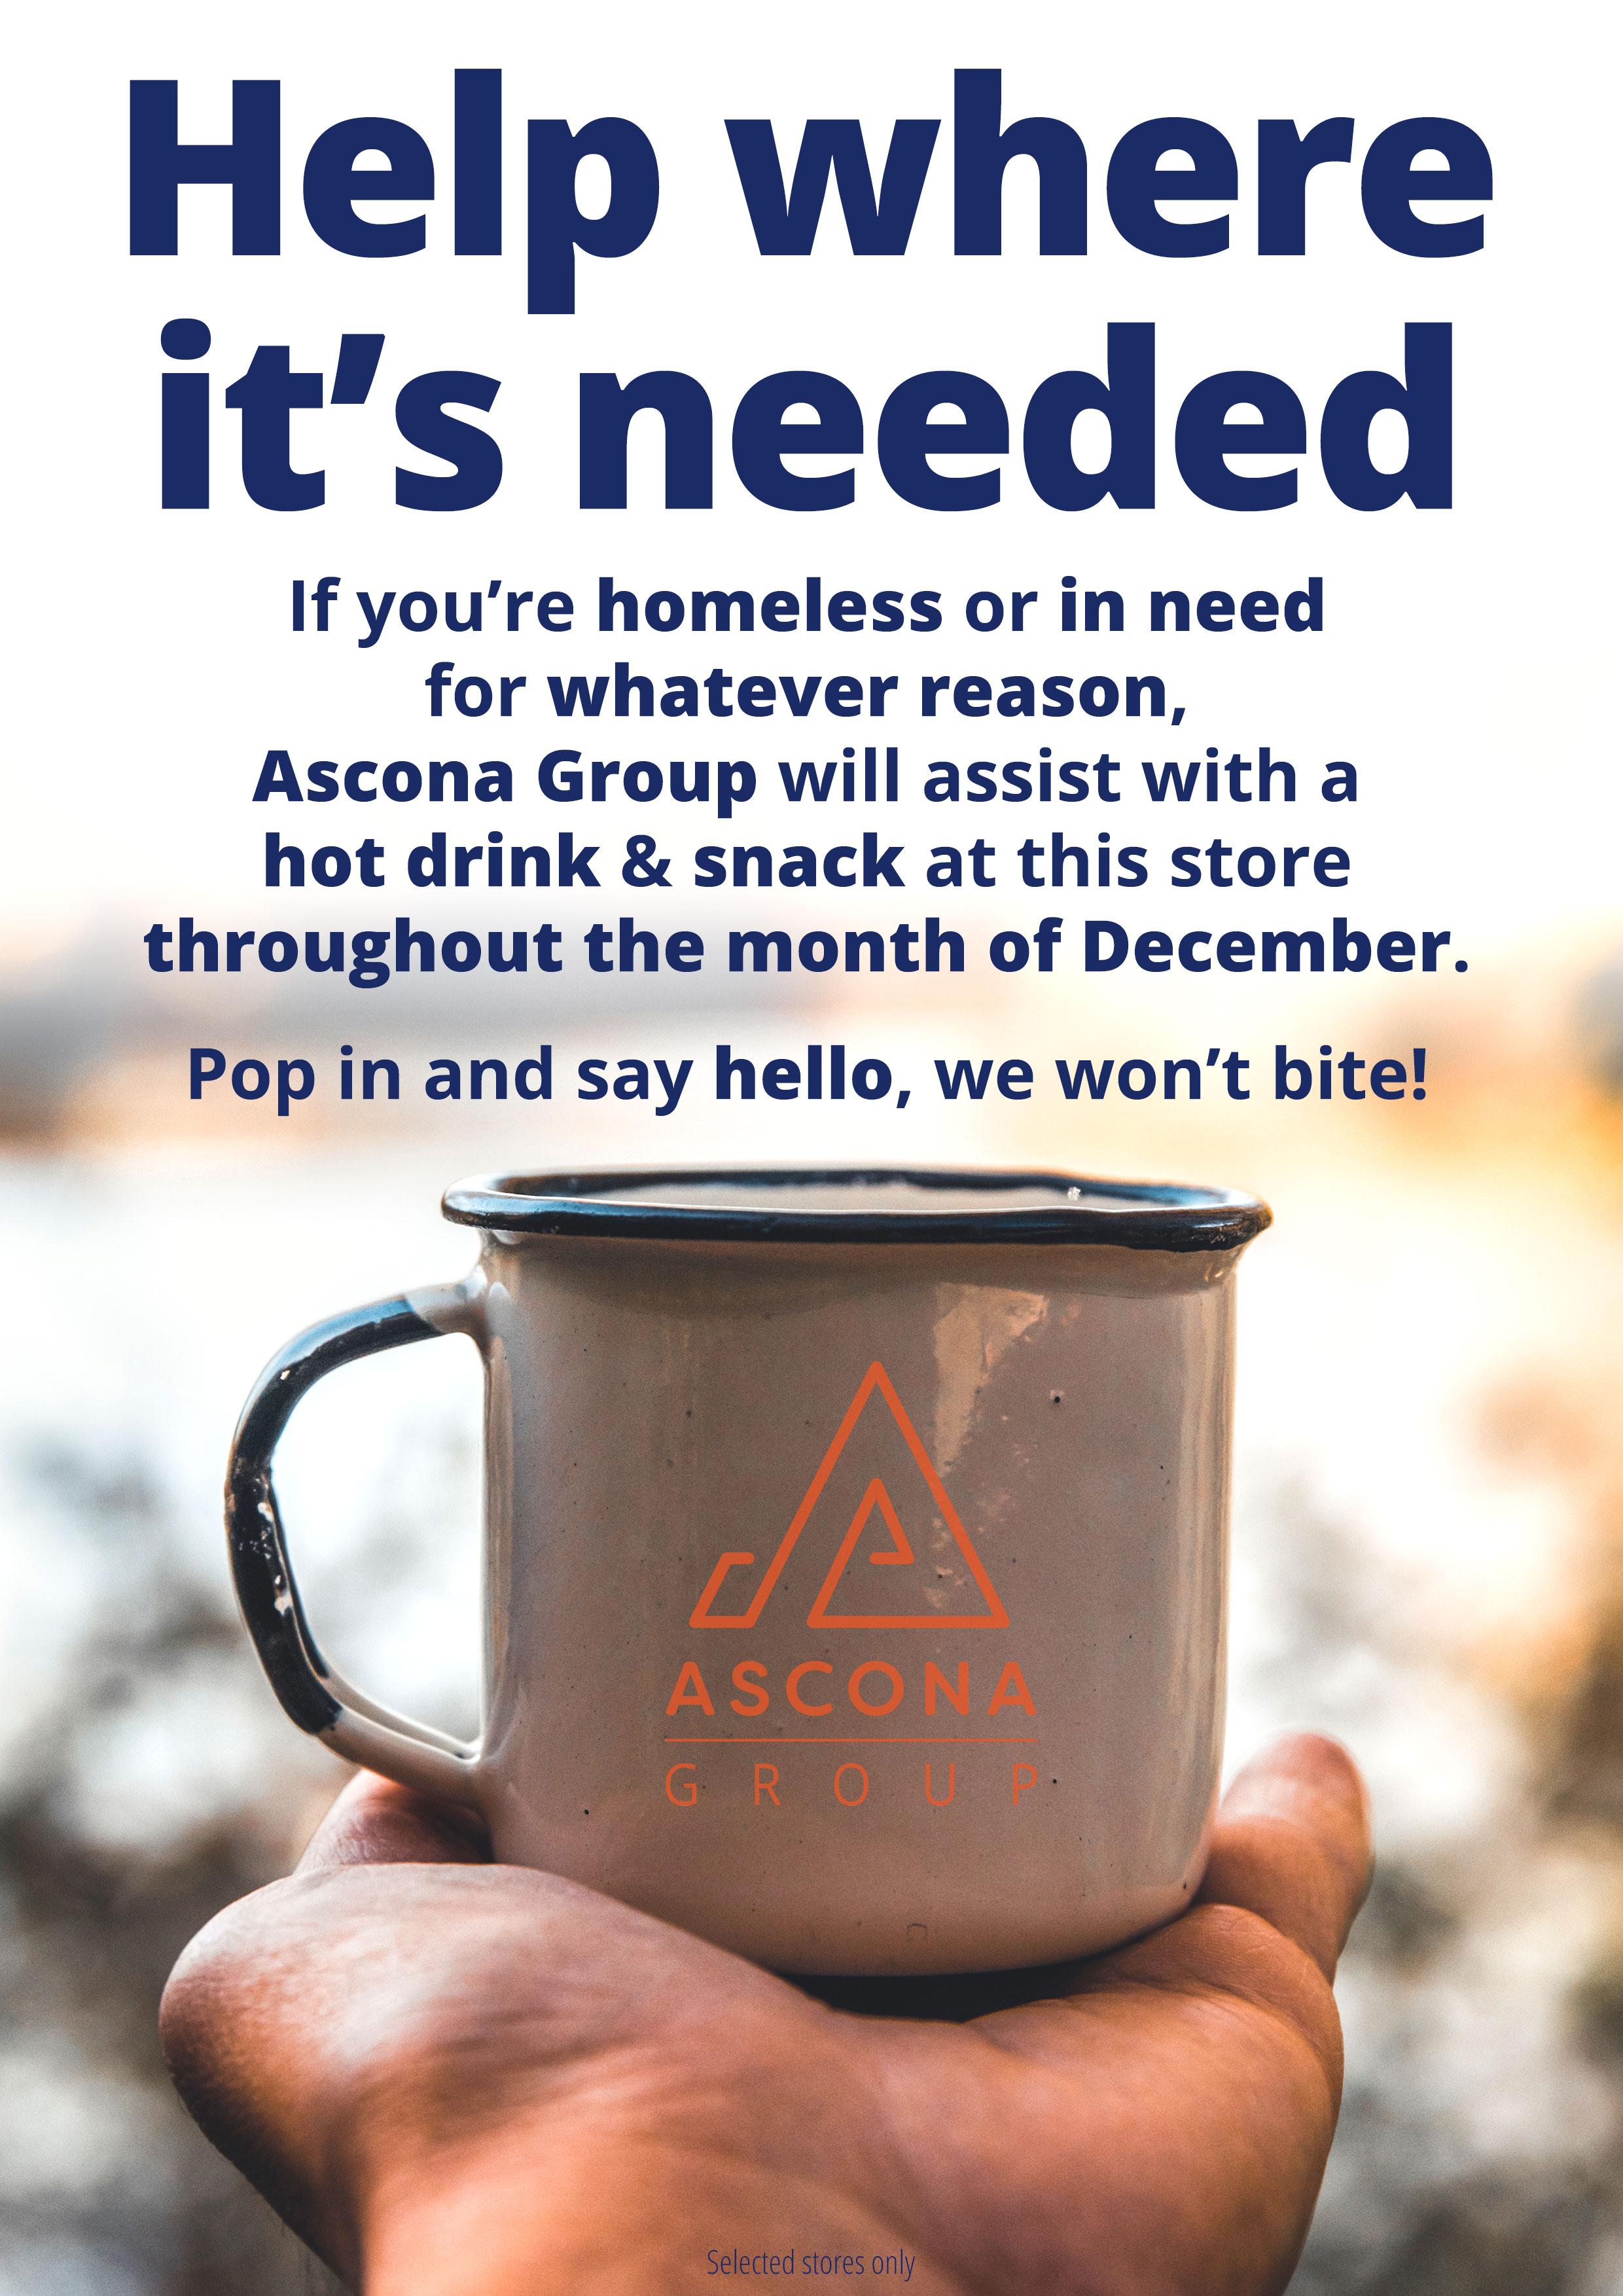 Help where it's needed